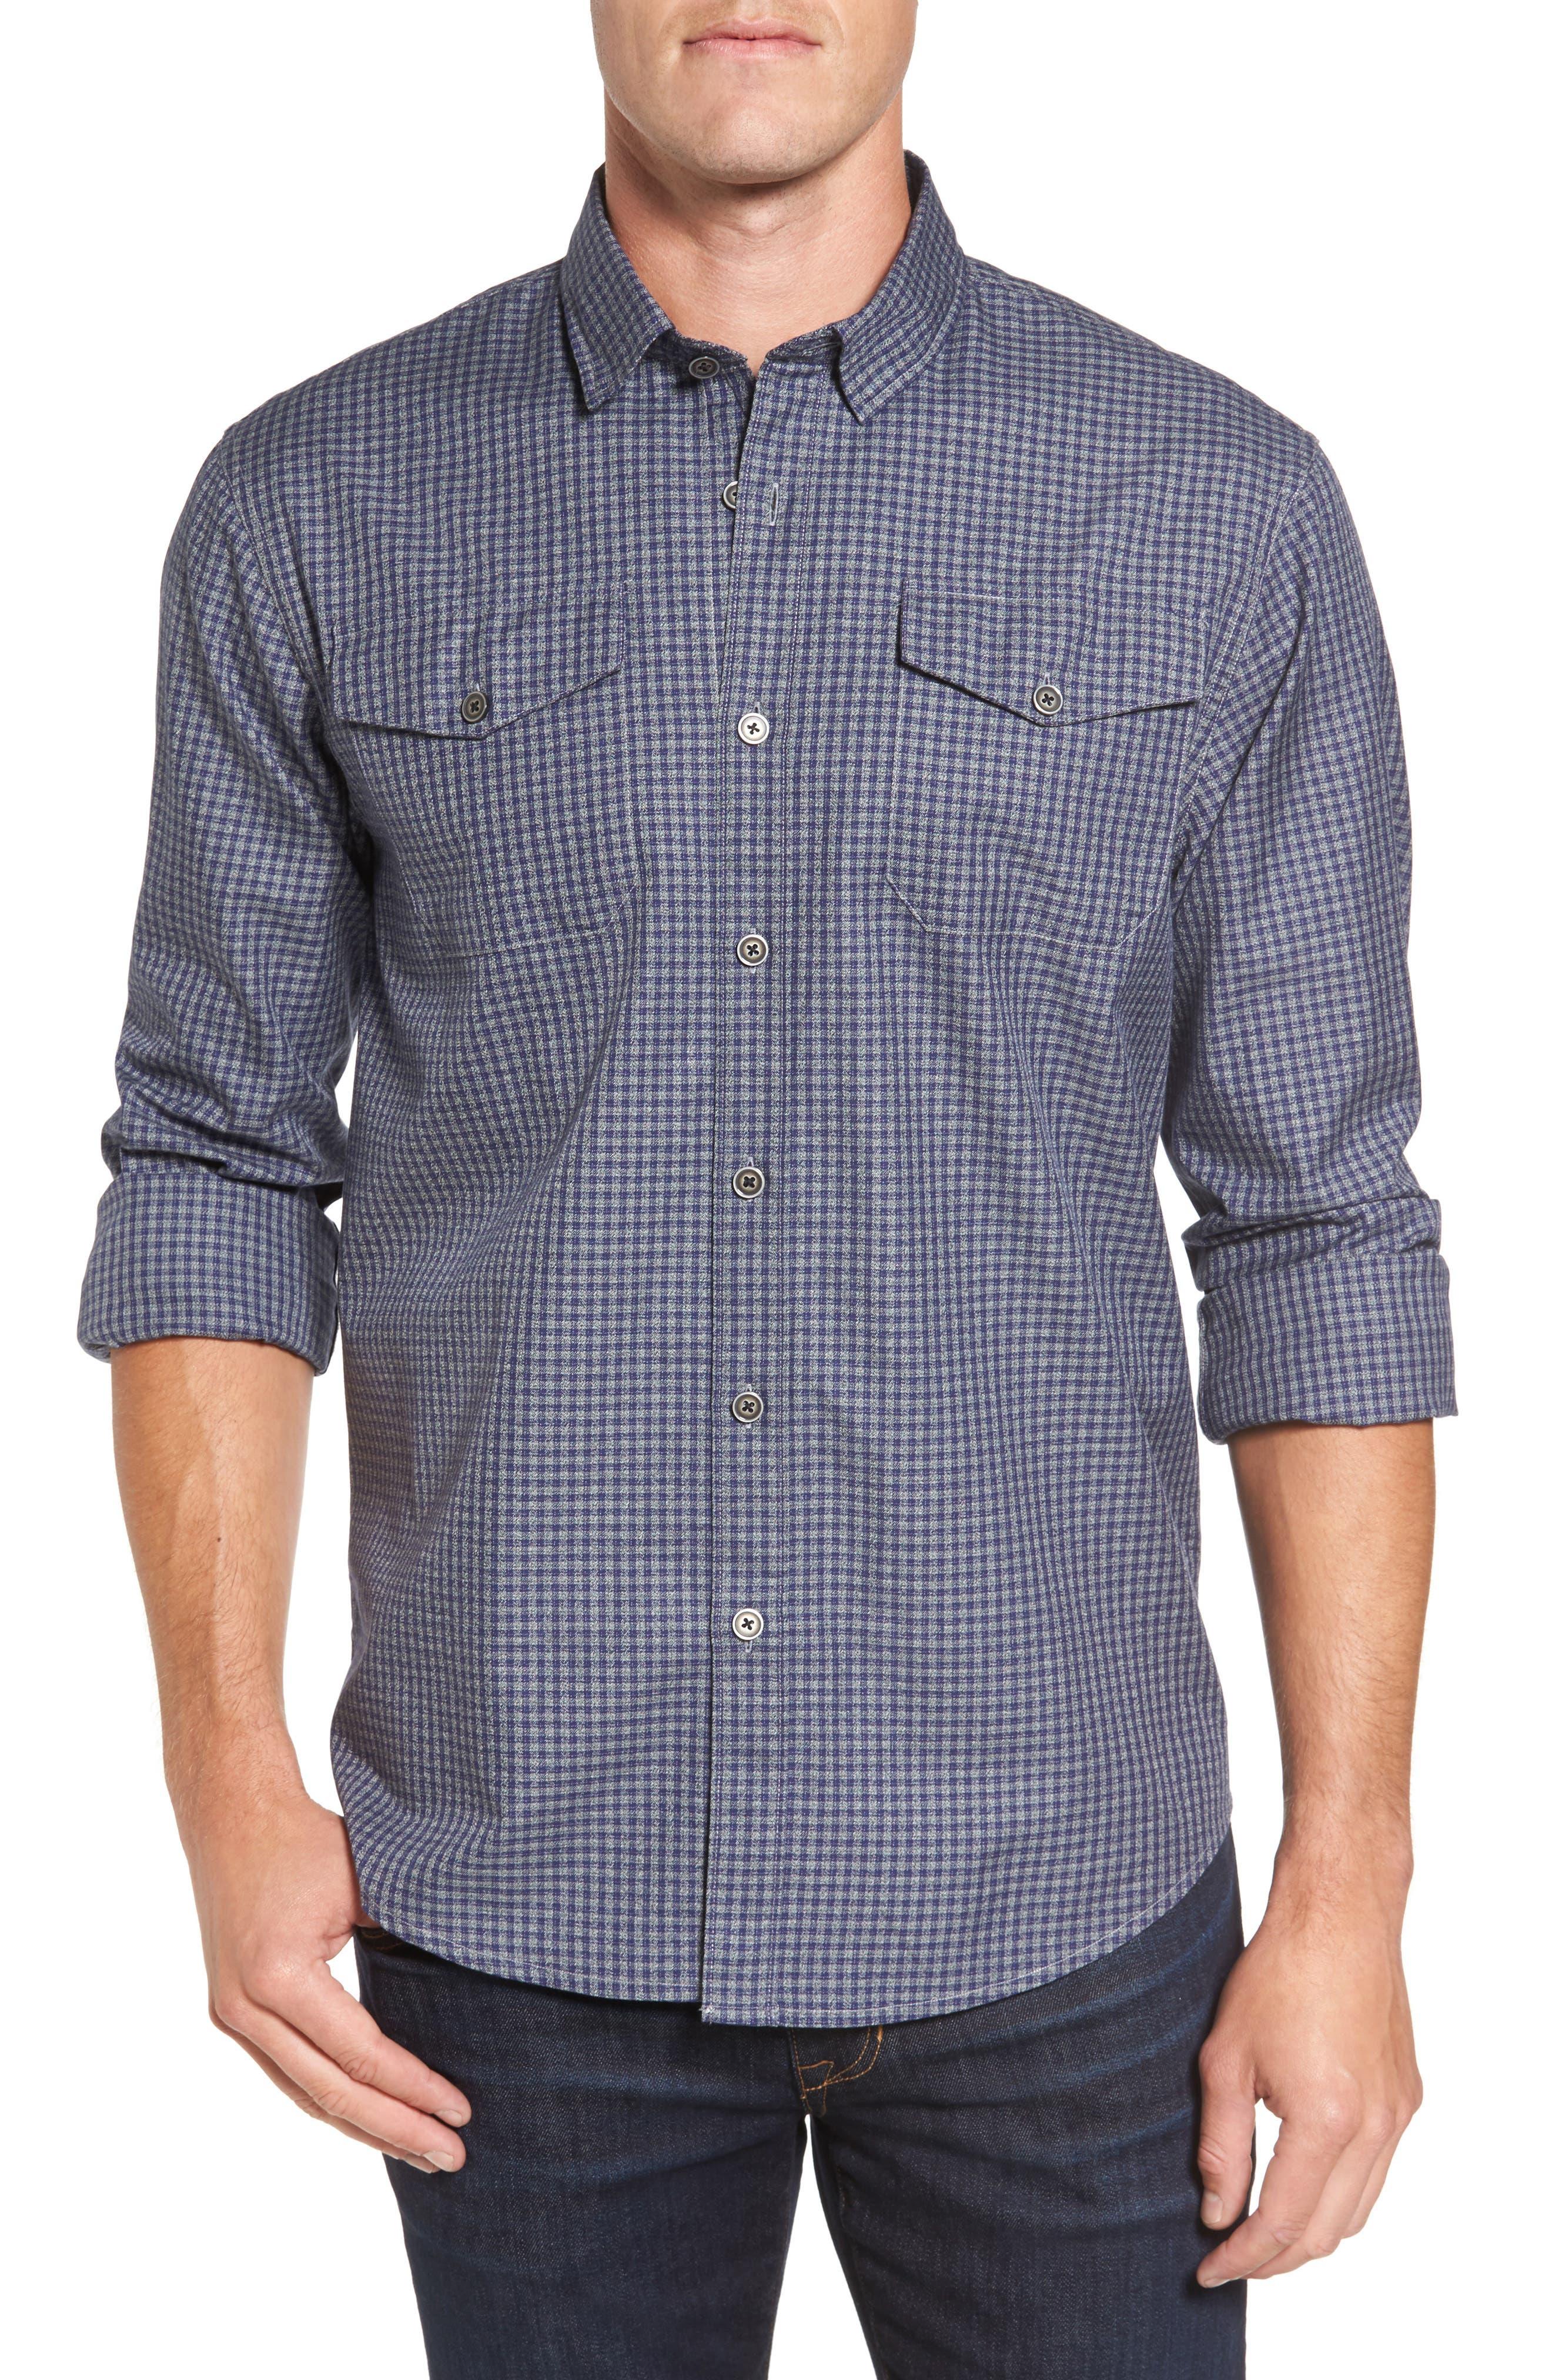 Main Street Check Flannel Shirt,                             Main thumbnail 1, color,                             405